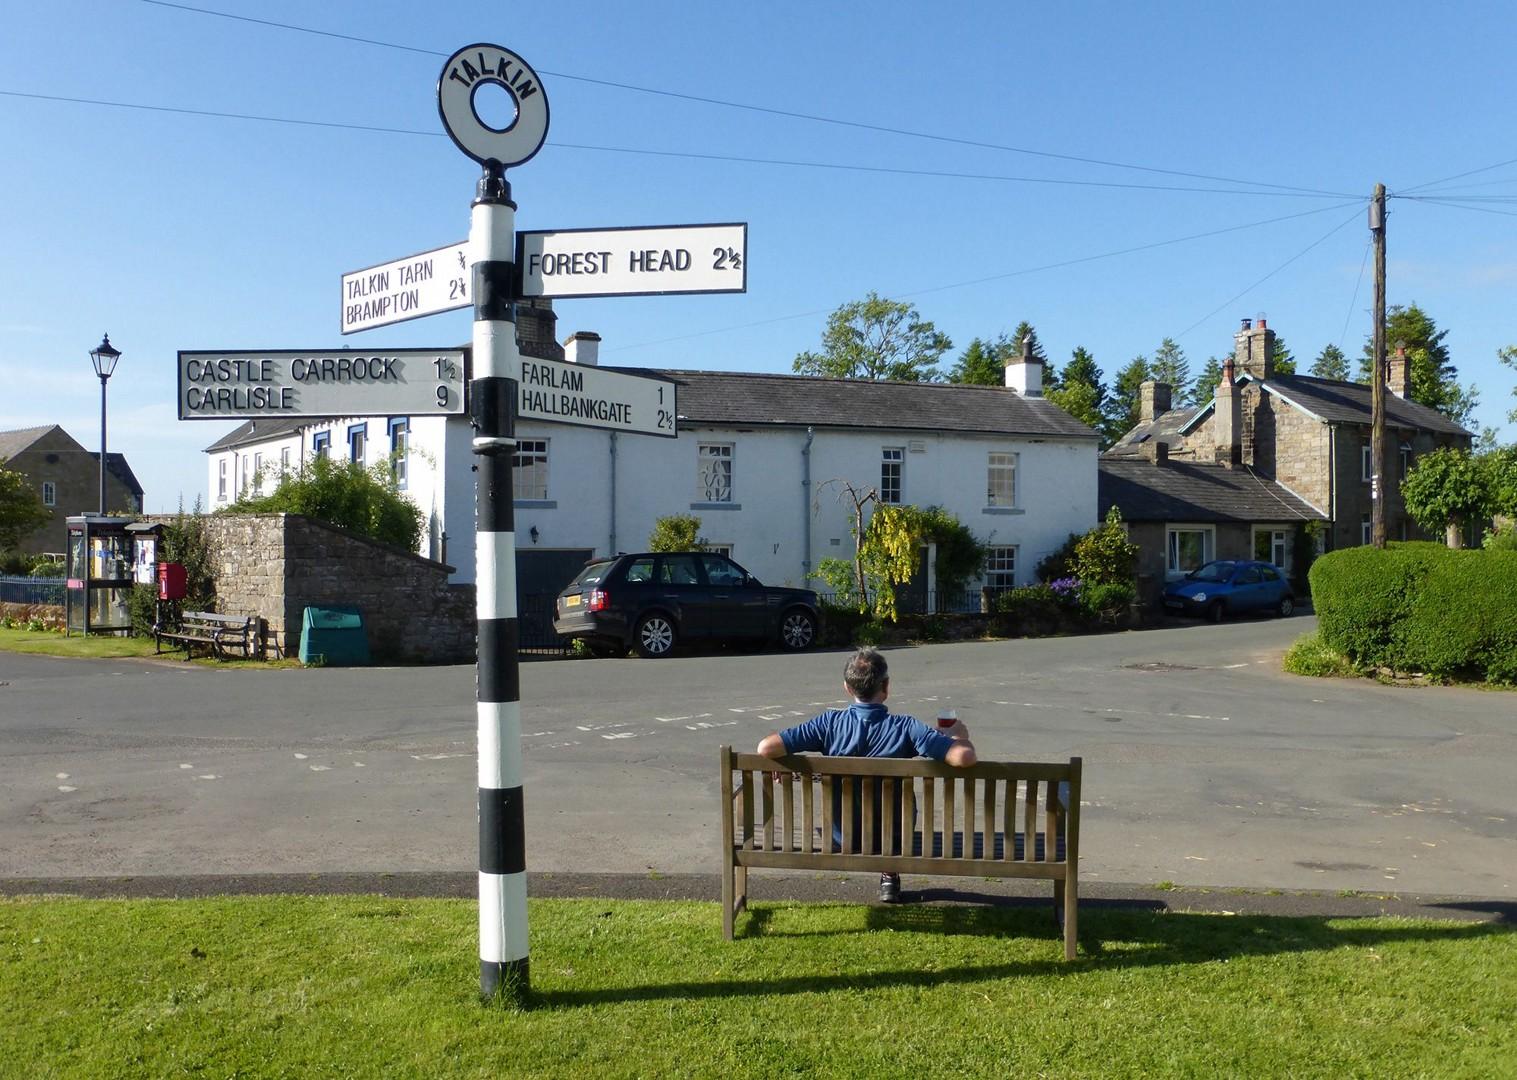 talkin-uk-cycling-lands-end-john-ogroats.jpg - UK - Land's End to John O'Groats Explorer (22 days) - Guided Cycling Holiday - Road Cycling